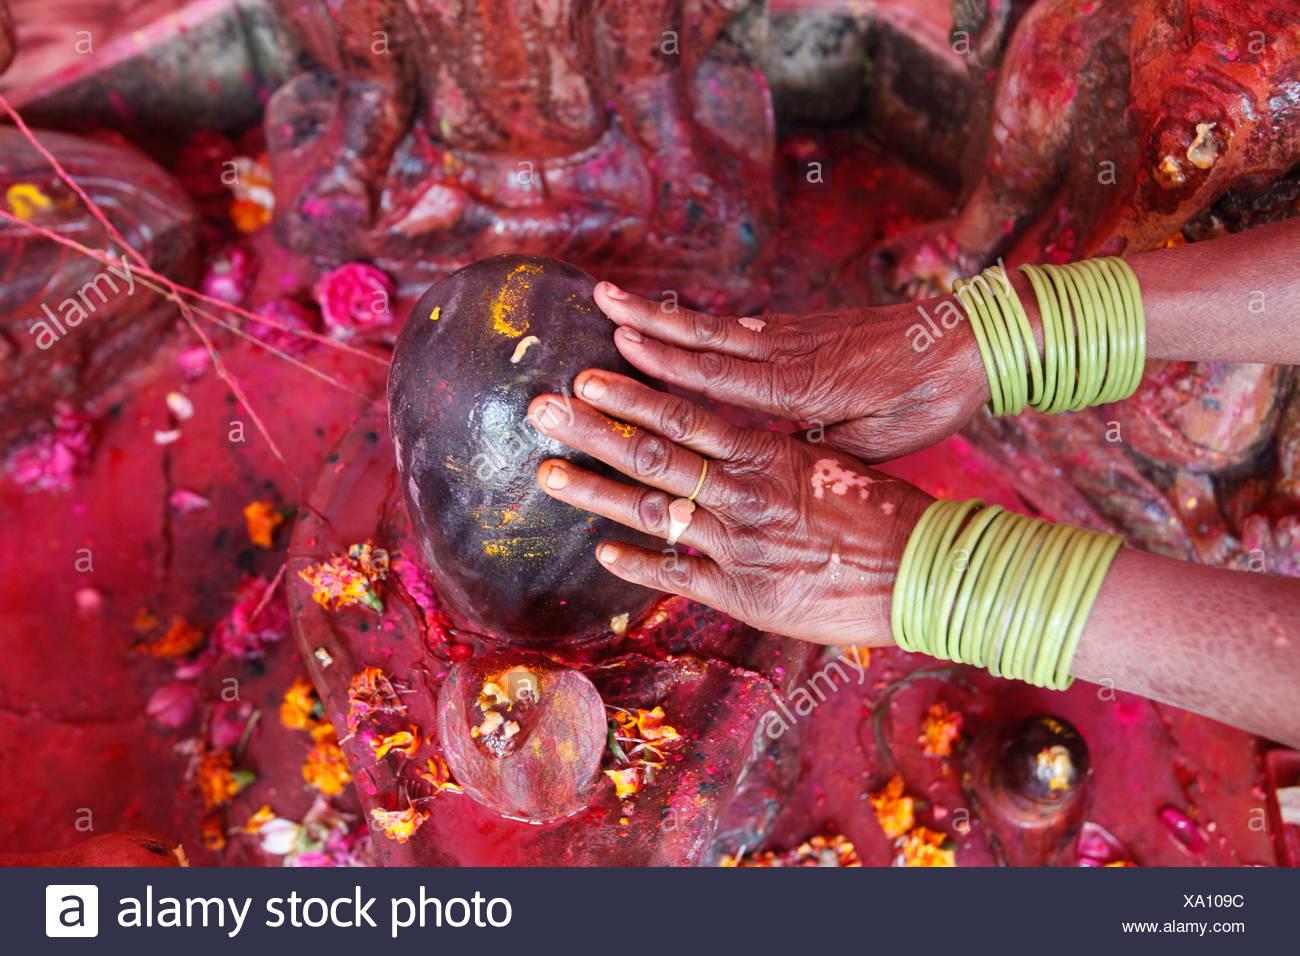 Holi célébration dans Goverdan. Femme hindoue adorant un lingam Goverdan. L'Inde. Photo Stock